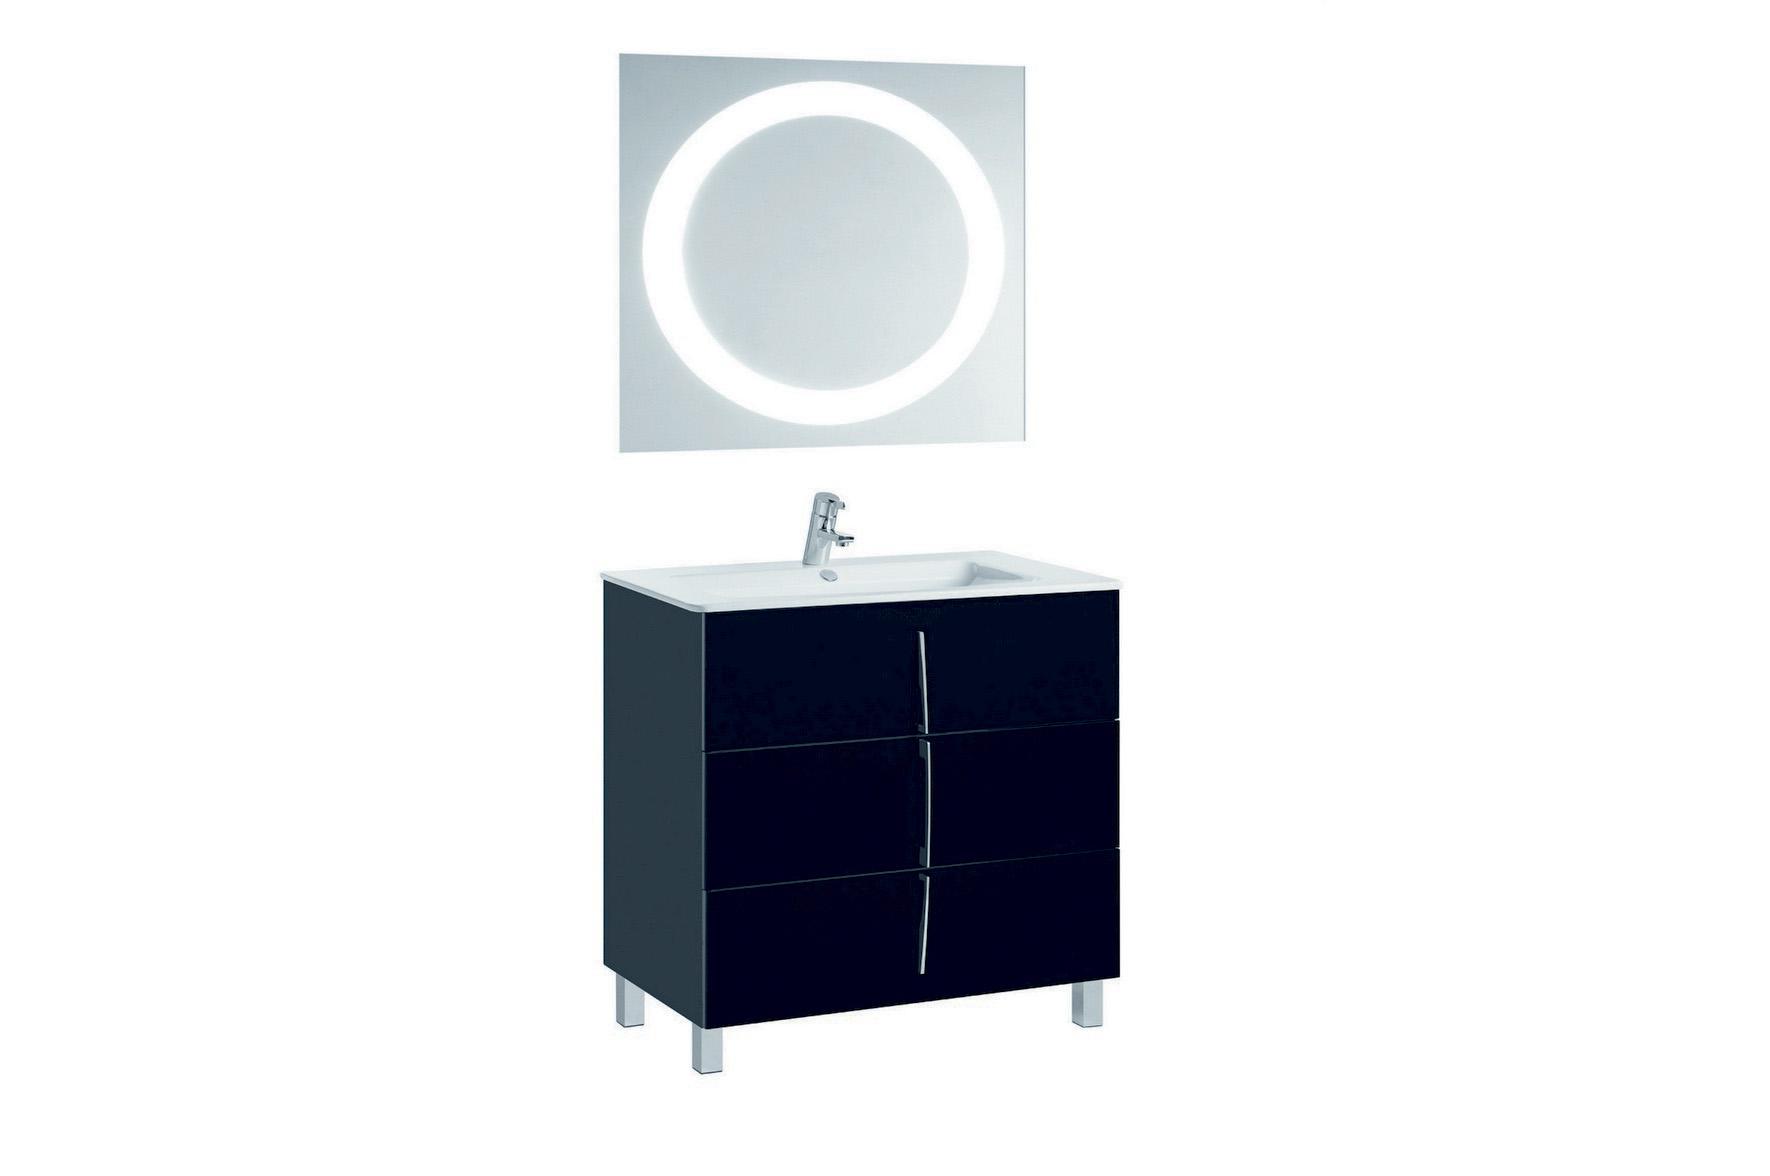 Mobilier negru 80 cm CUARZO 3C cu lavoar Emma si oglinda cu lumina rotunda GALA - Poza 10